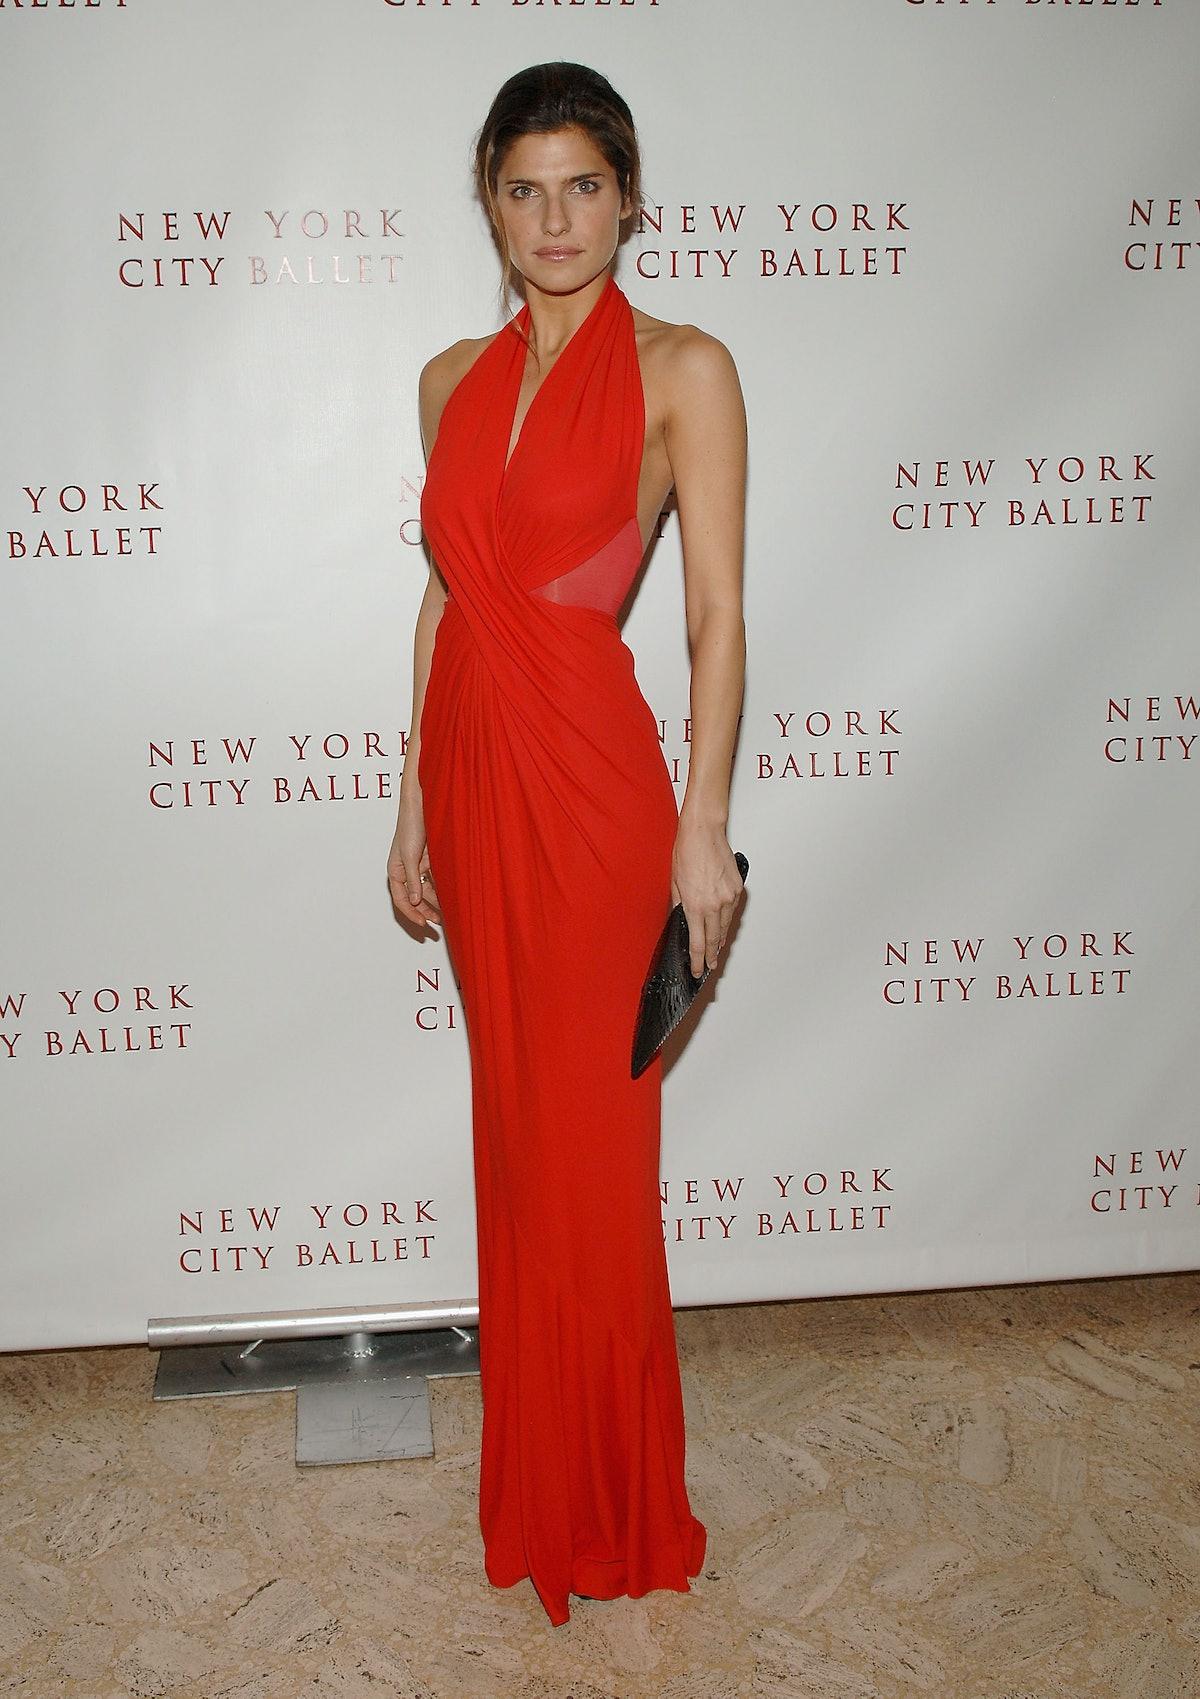 2007-2008 New York City Ballet Opening Night Gala